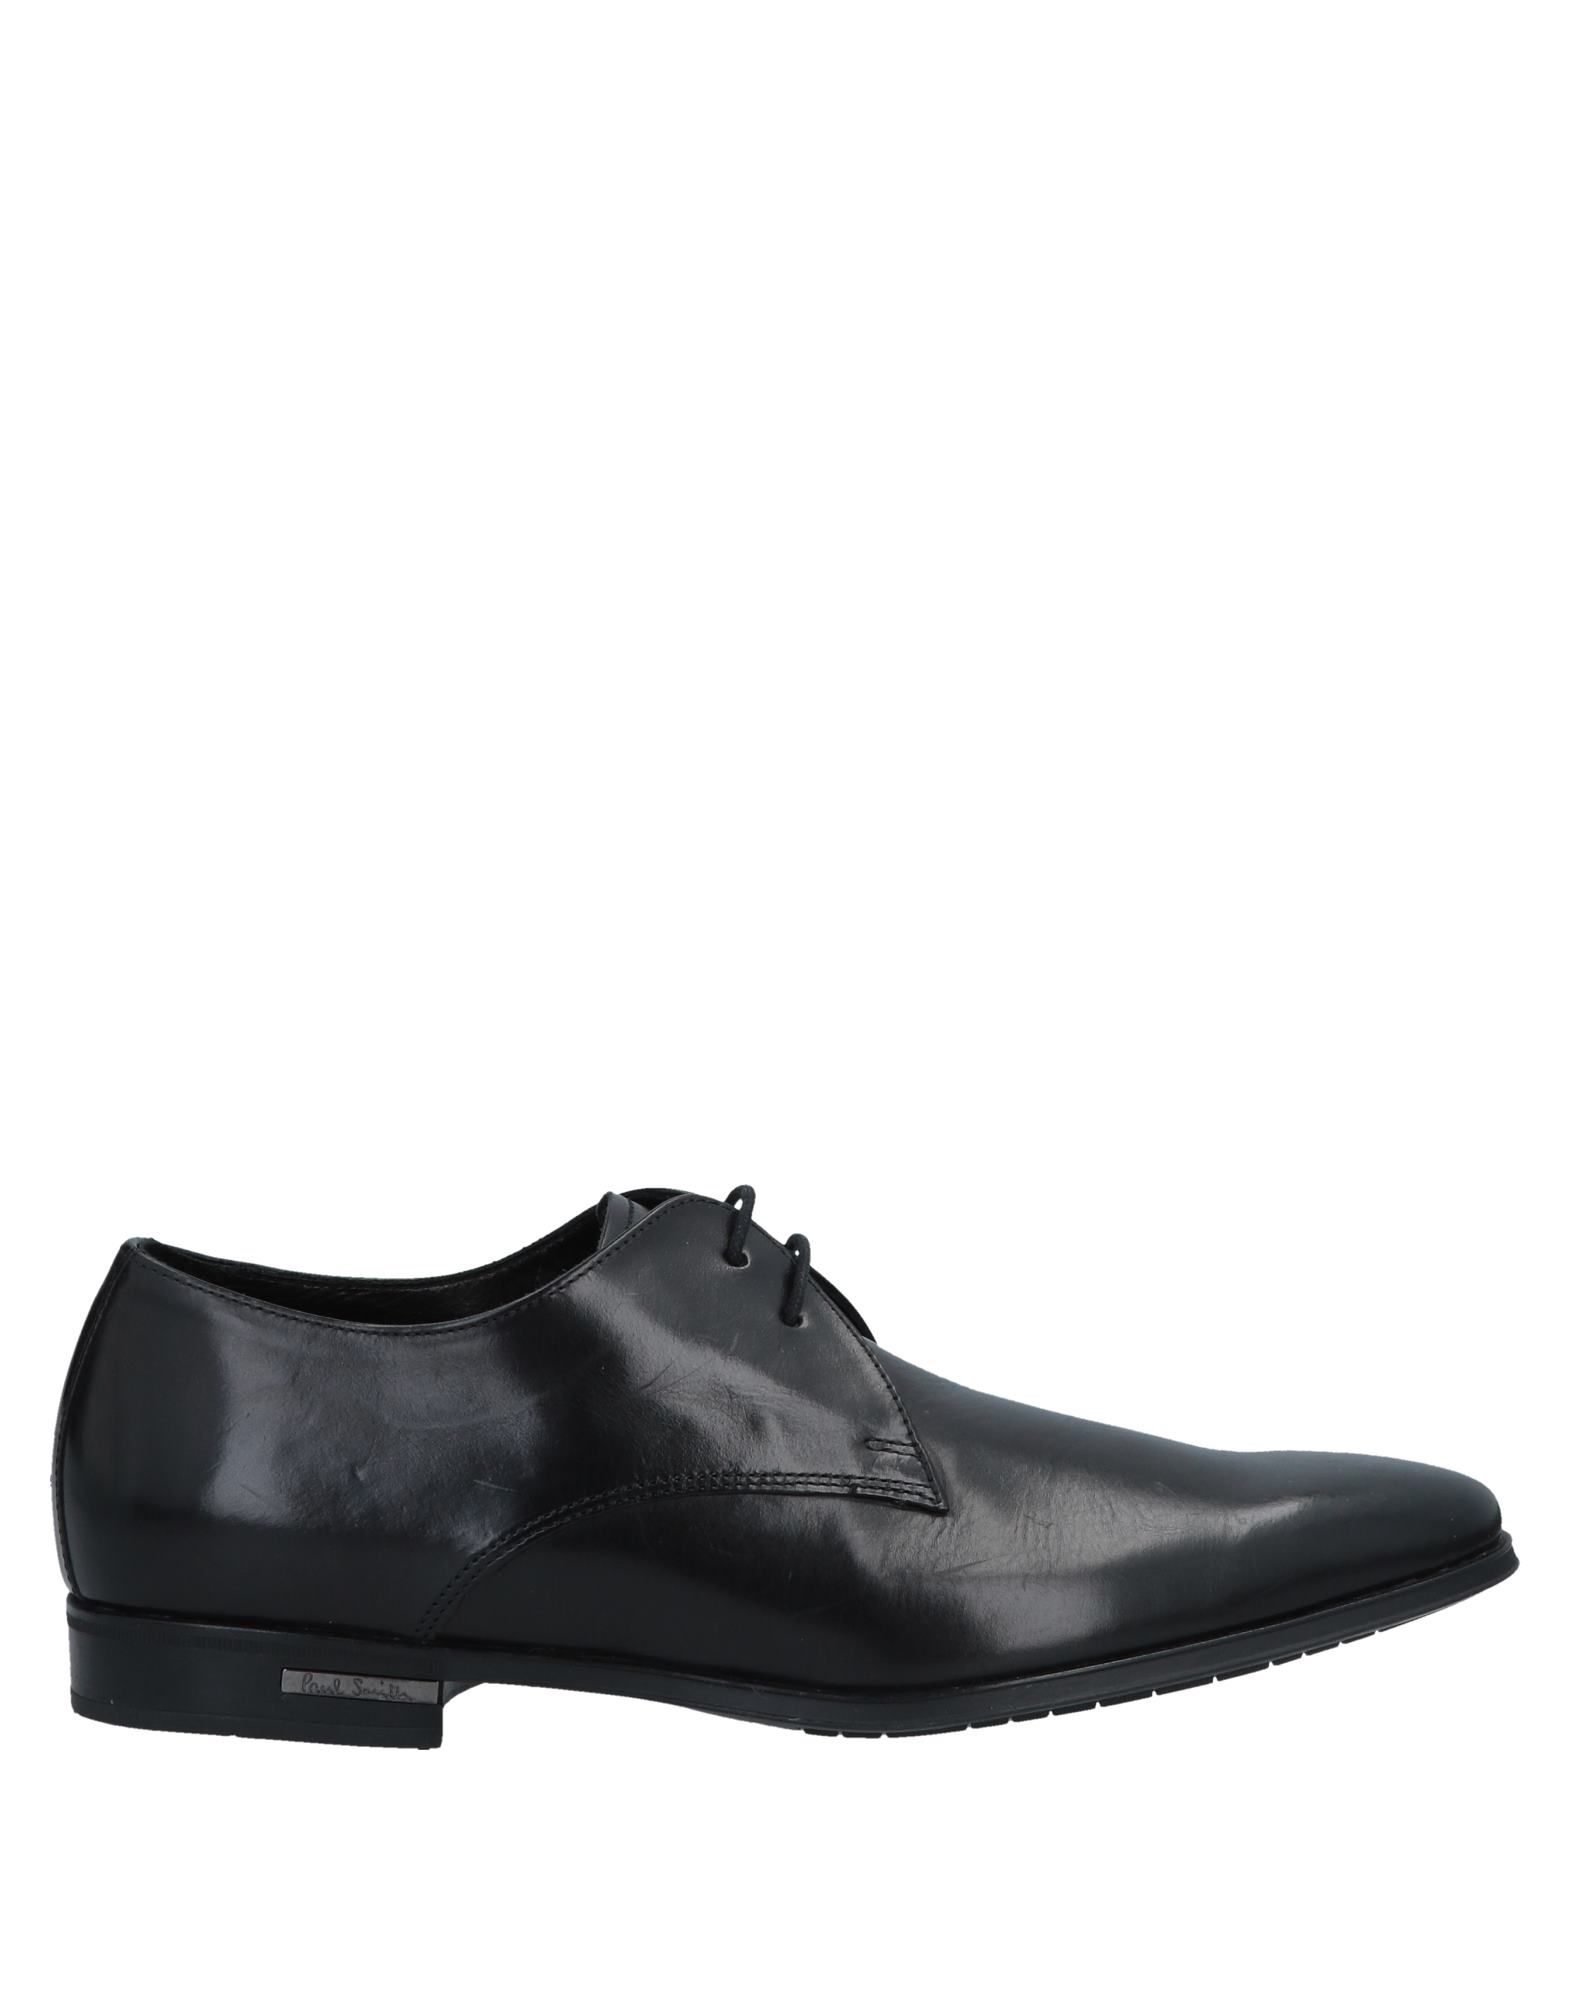 Фото - PAUL SMITH Обувь на шнурках alexander smith обувь на шнурках